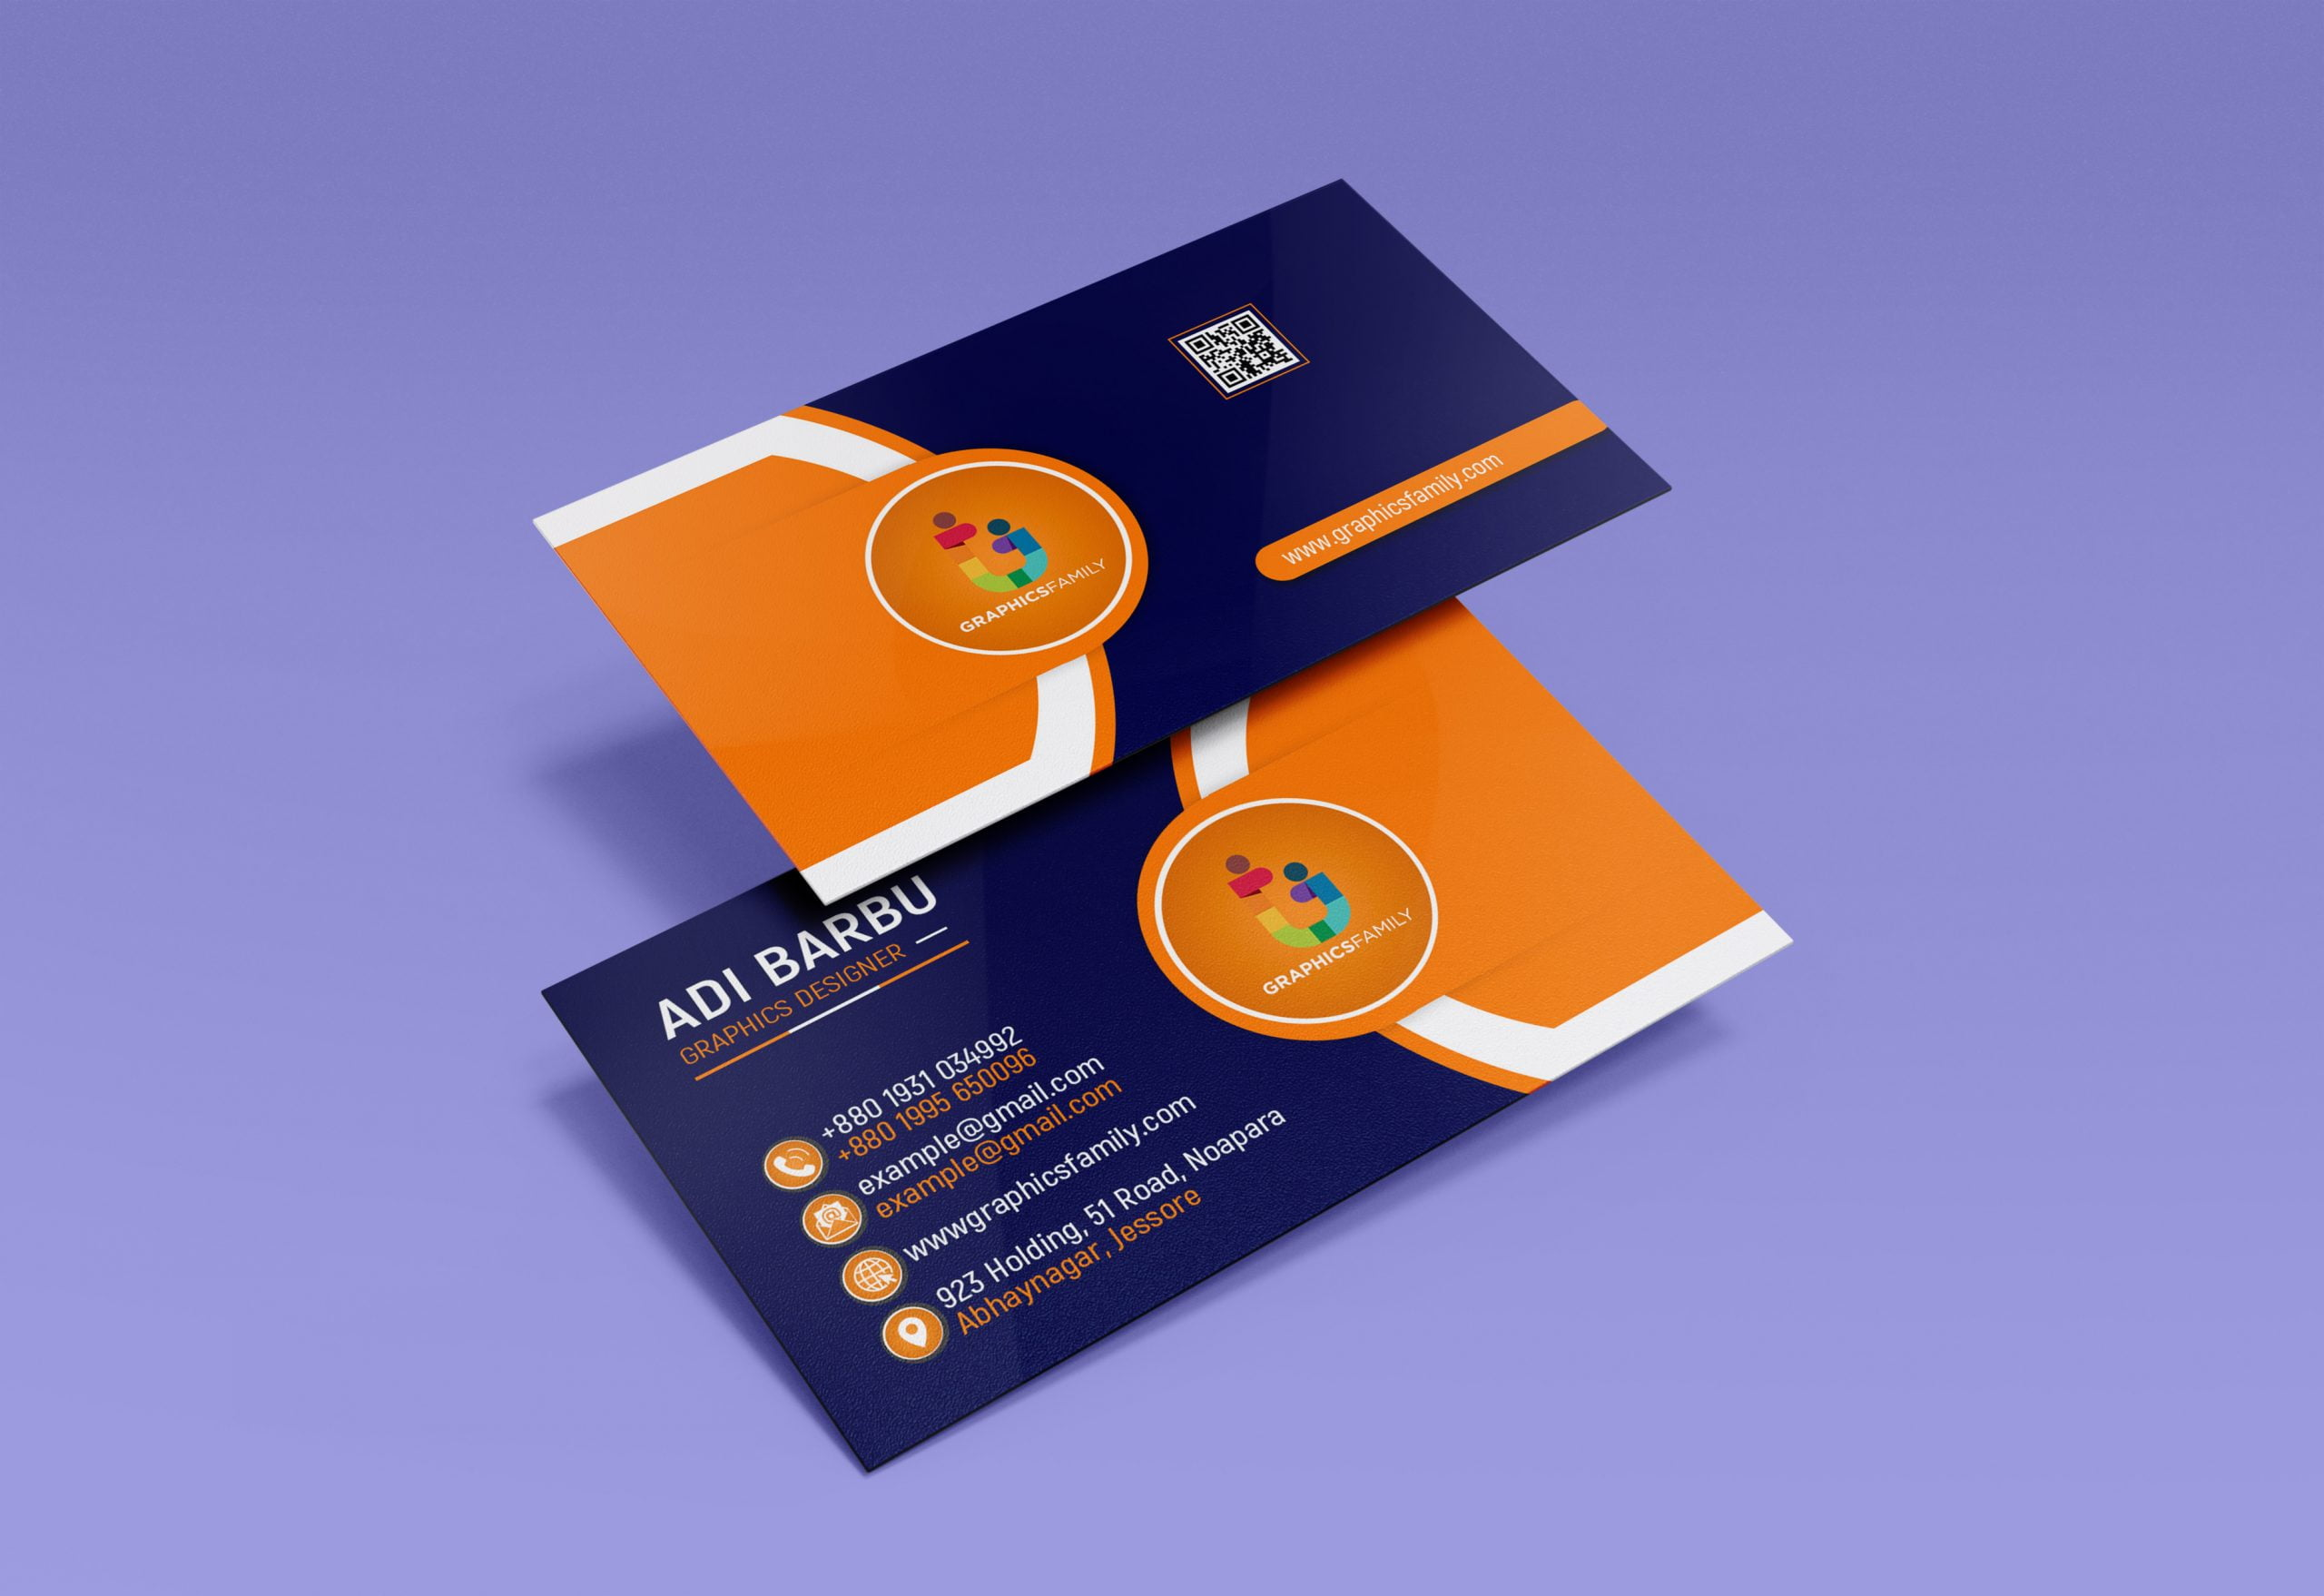 Download-Premium-Business-Card-Mockup-Free-PSD